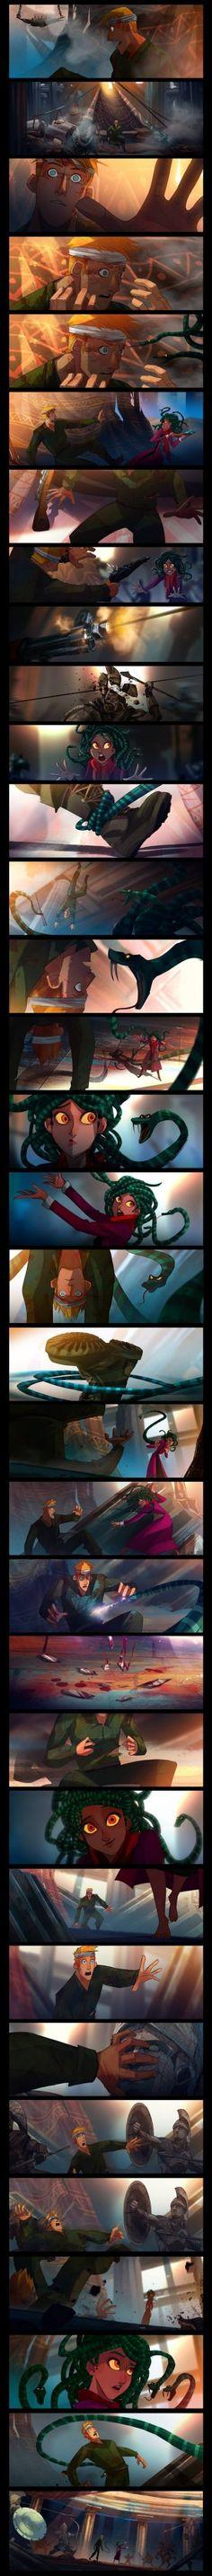 La historia de medusa parte 2